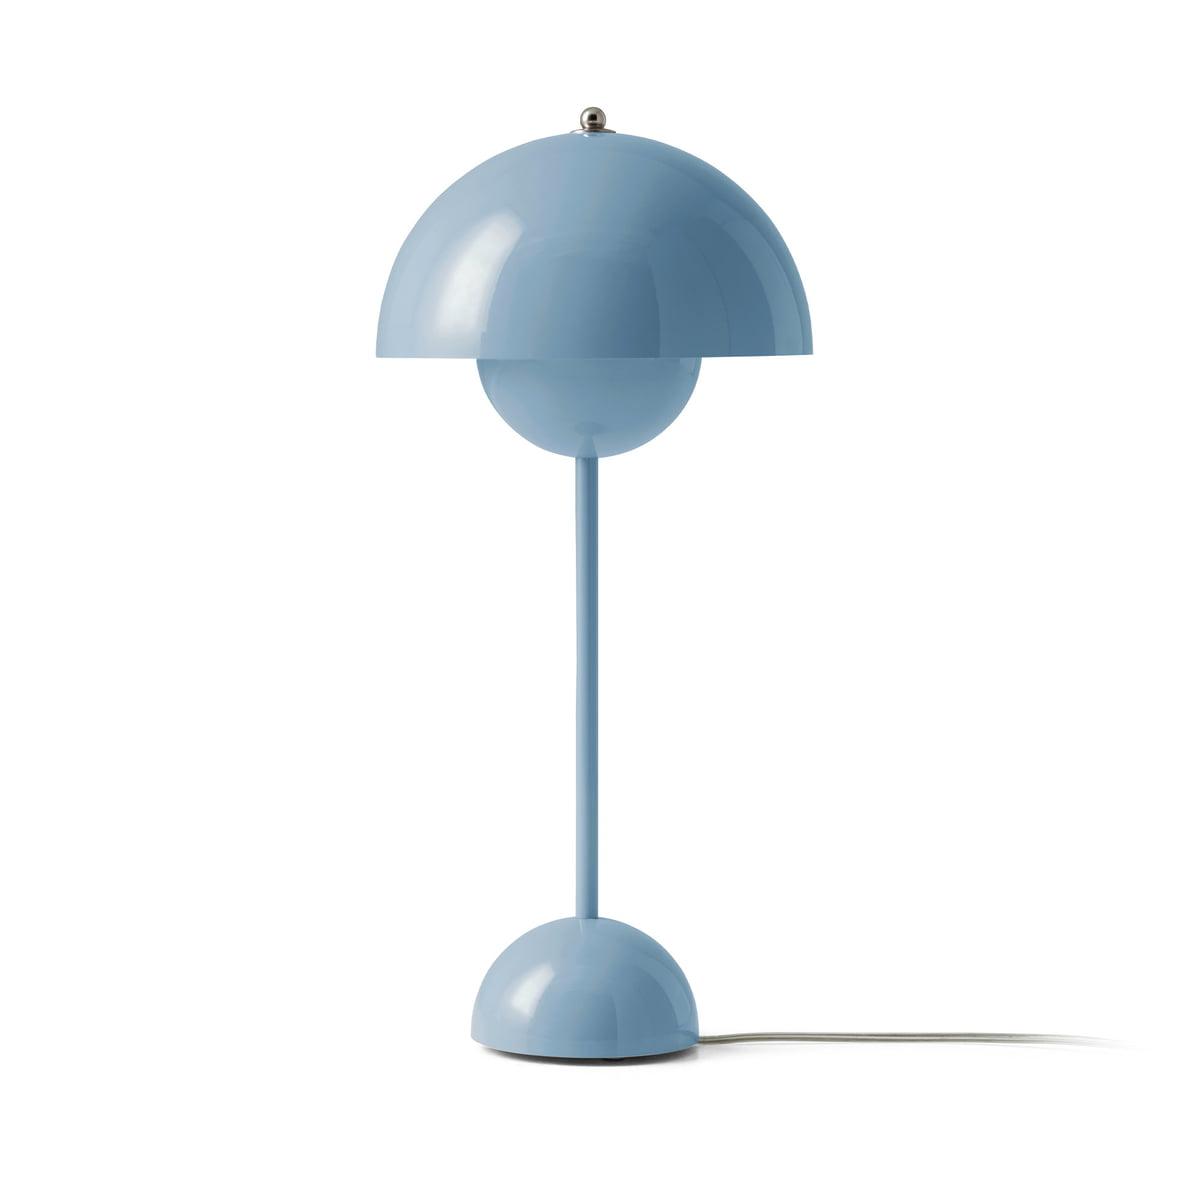 Lampe pastell